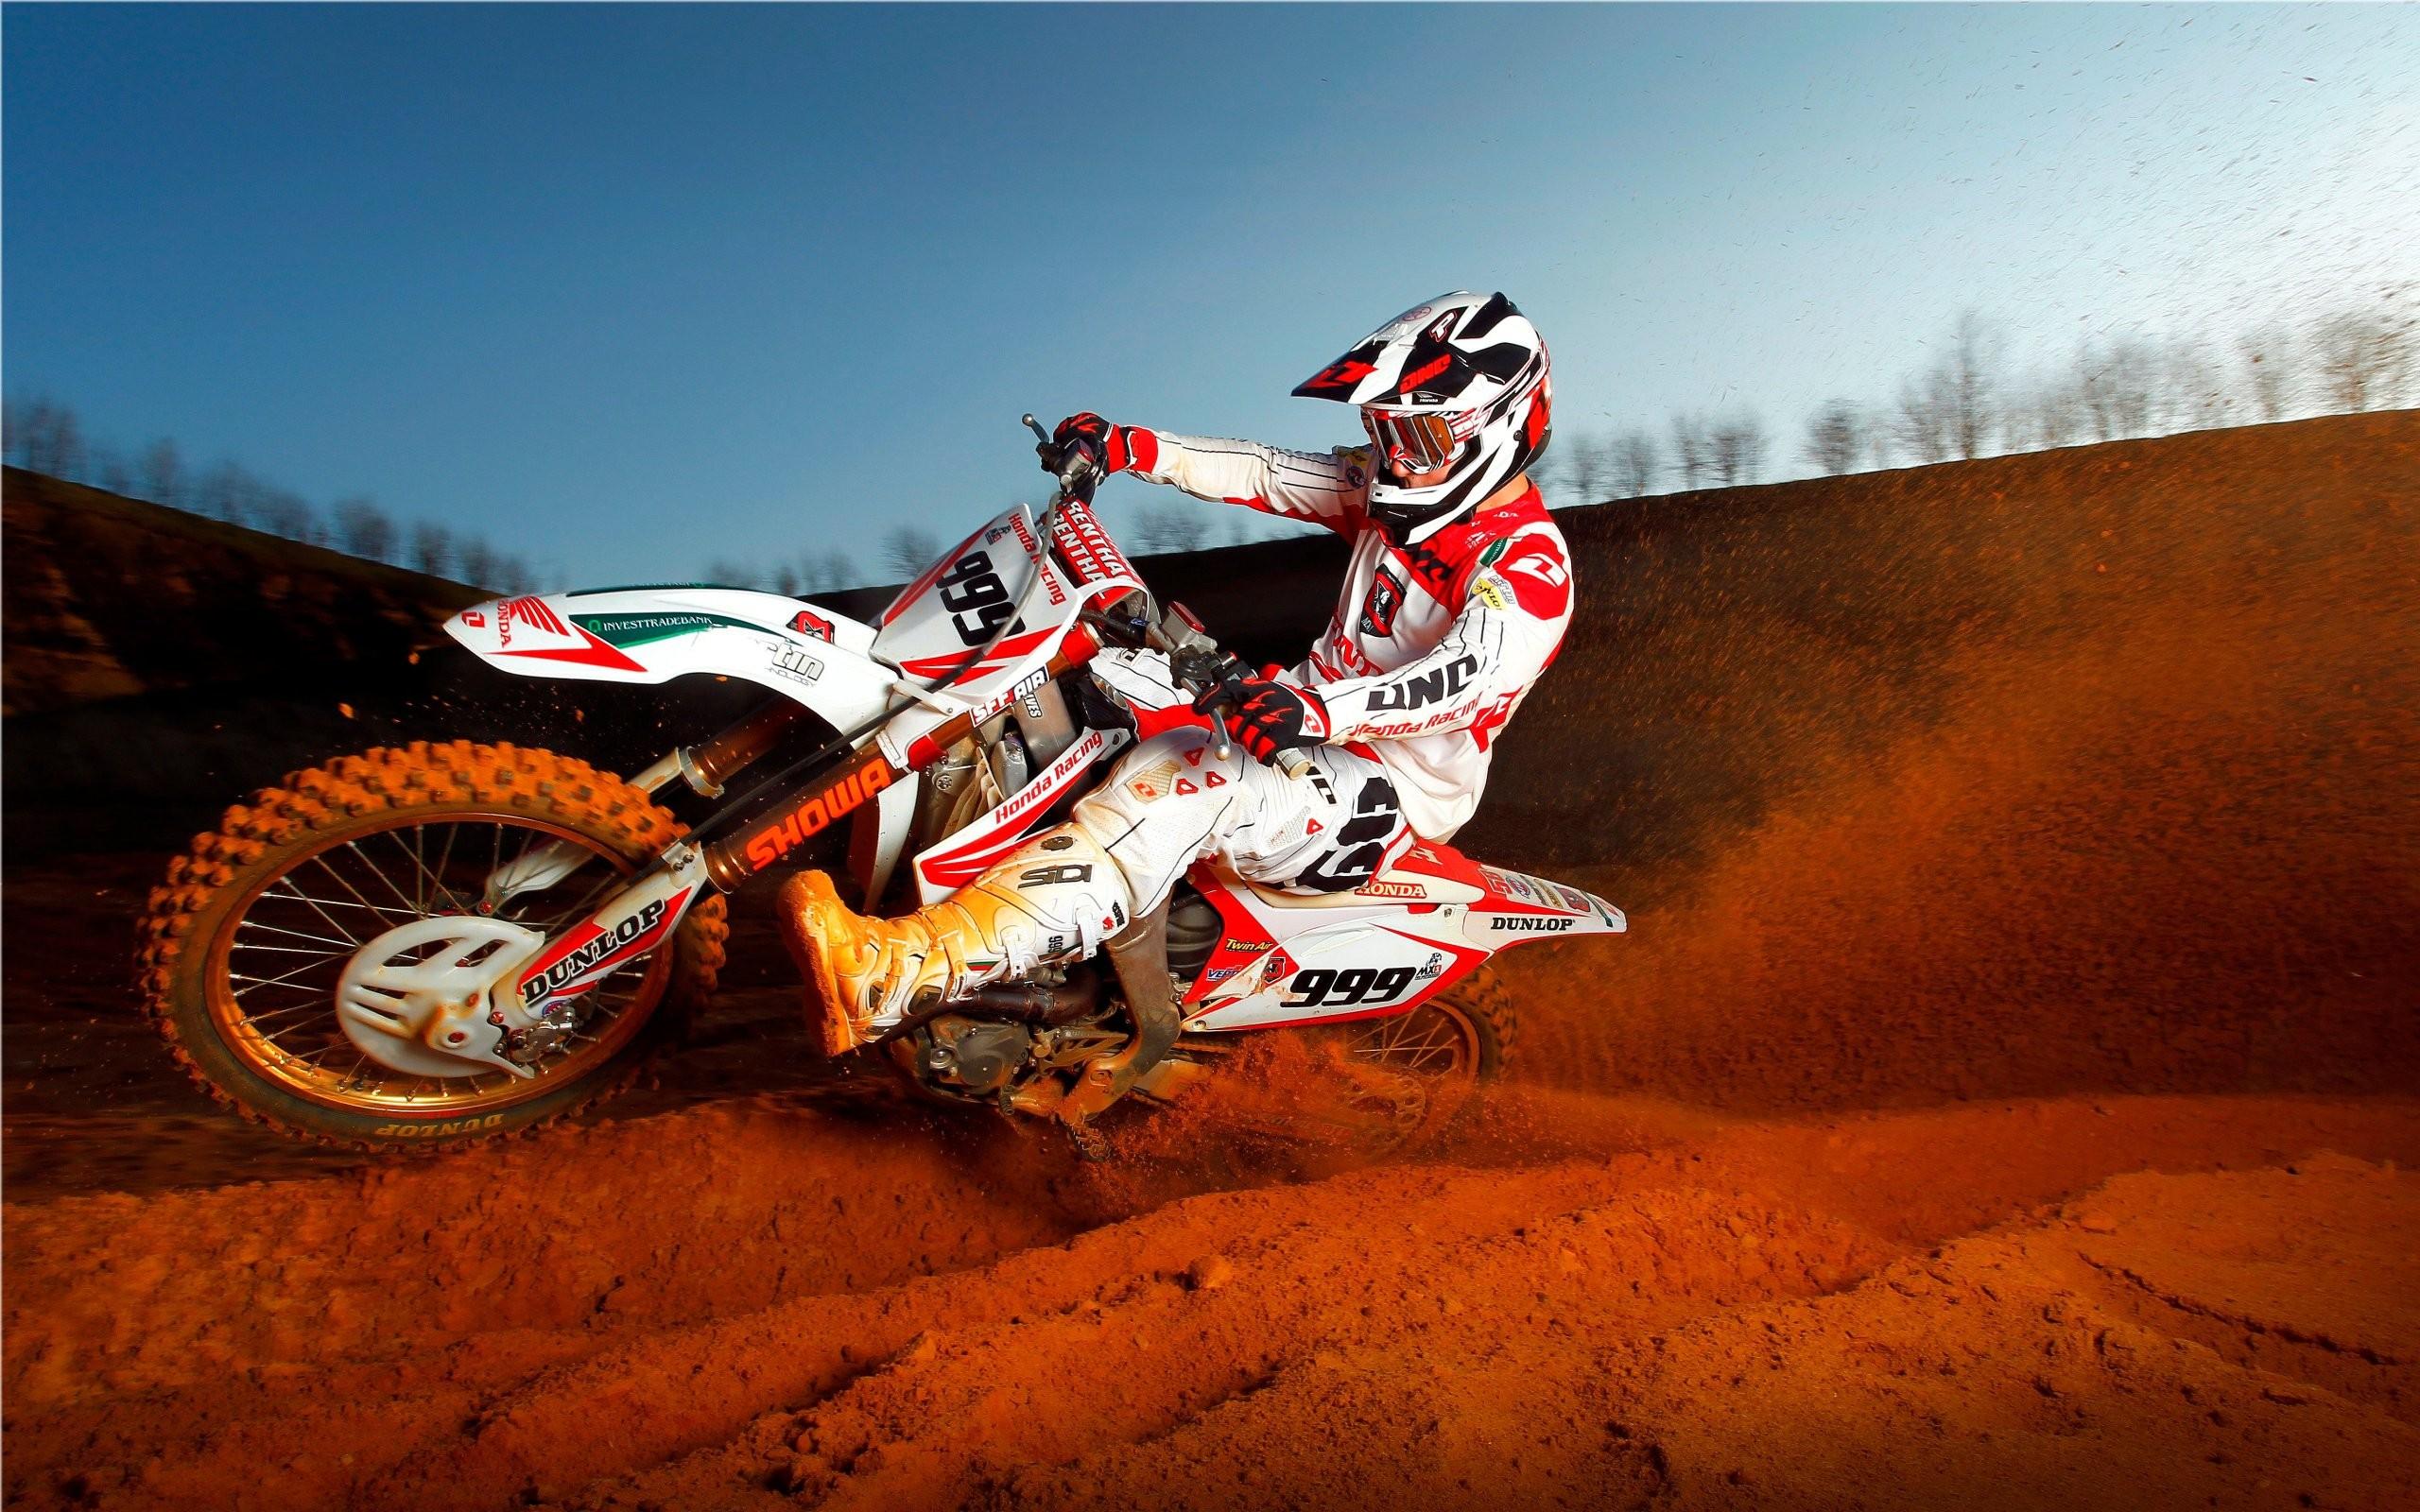 General 2560x1600 motocross sport  sports